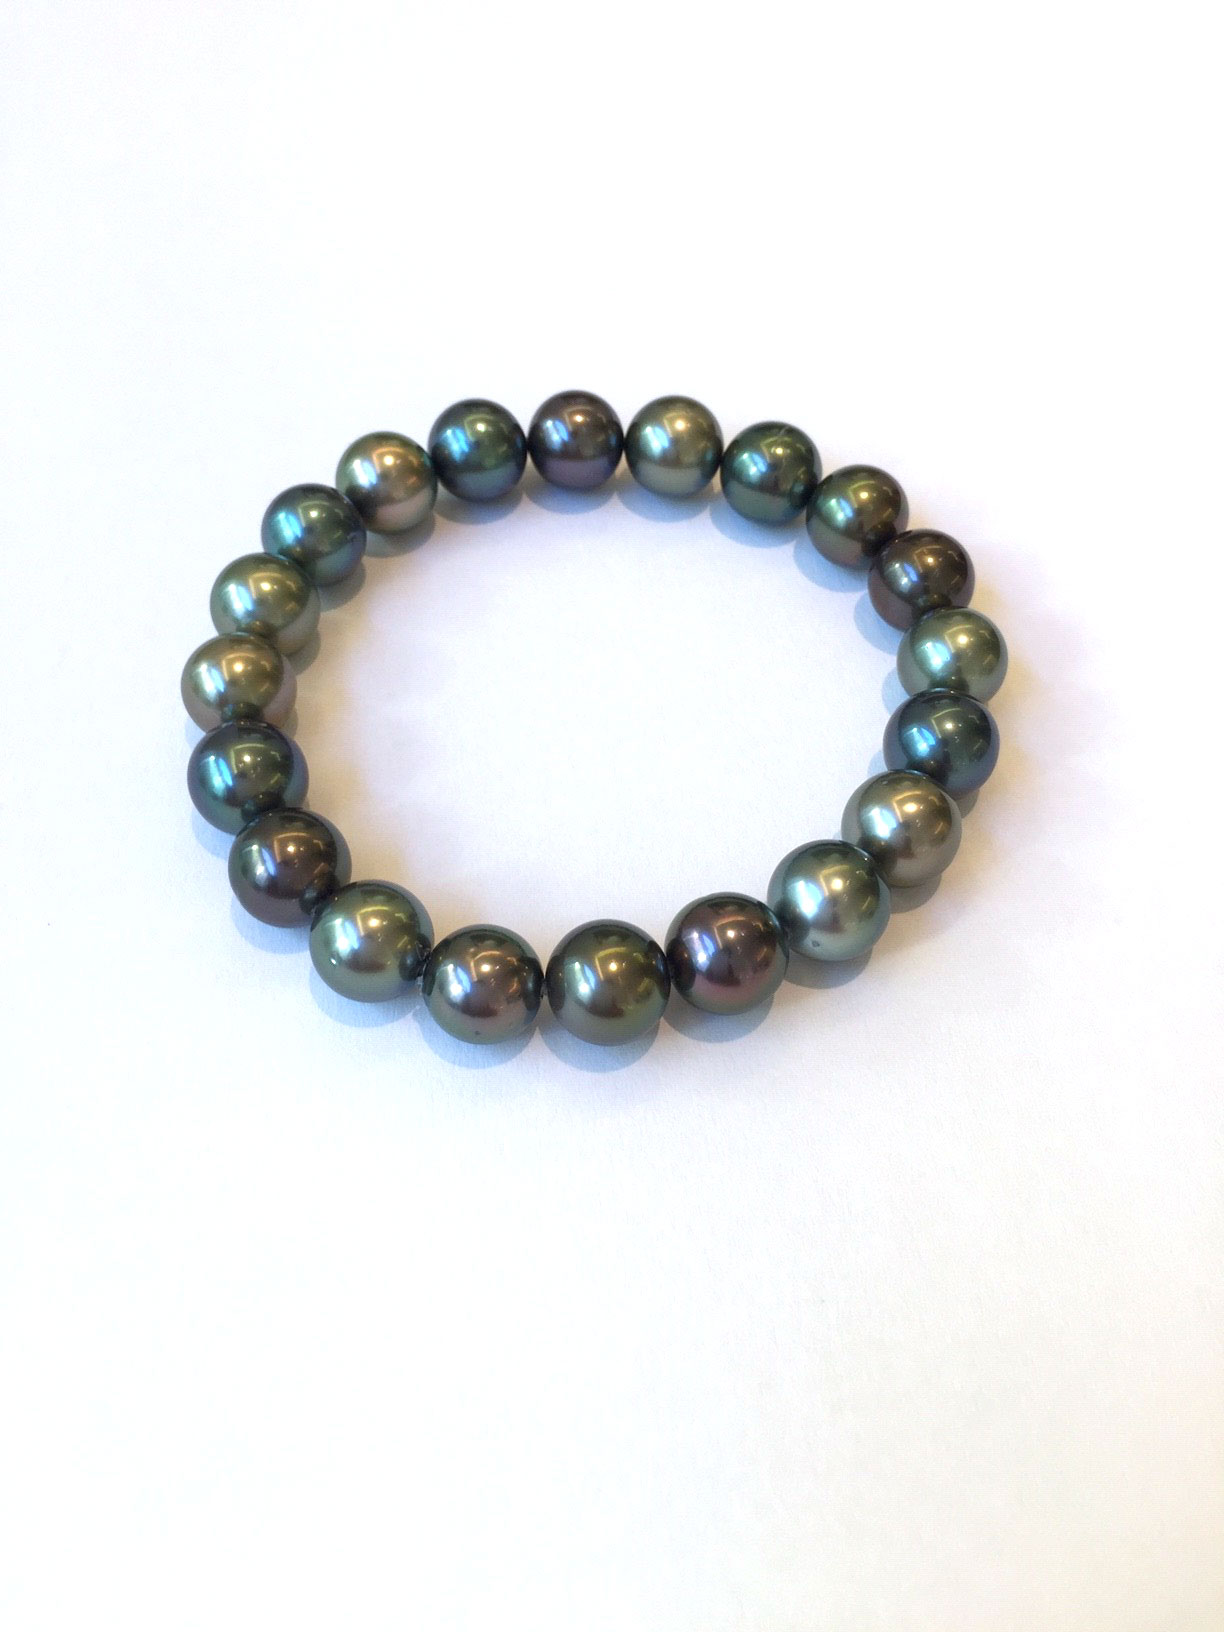 Tahitiperlenarmband - Schoeffel/Perle - 2223896-2